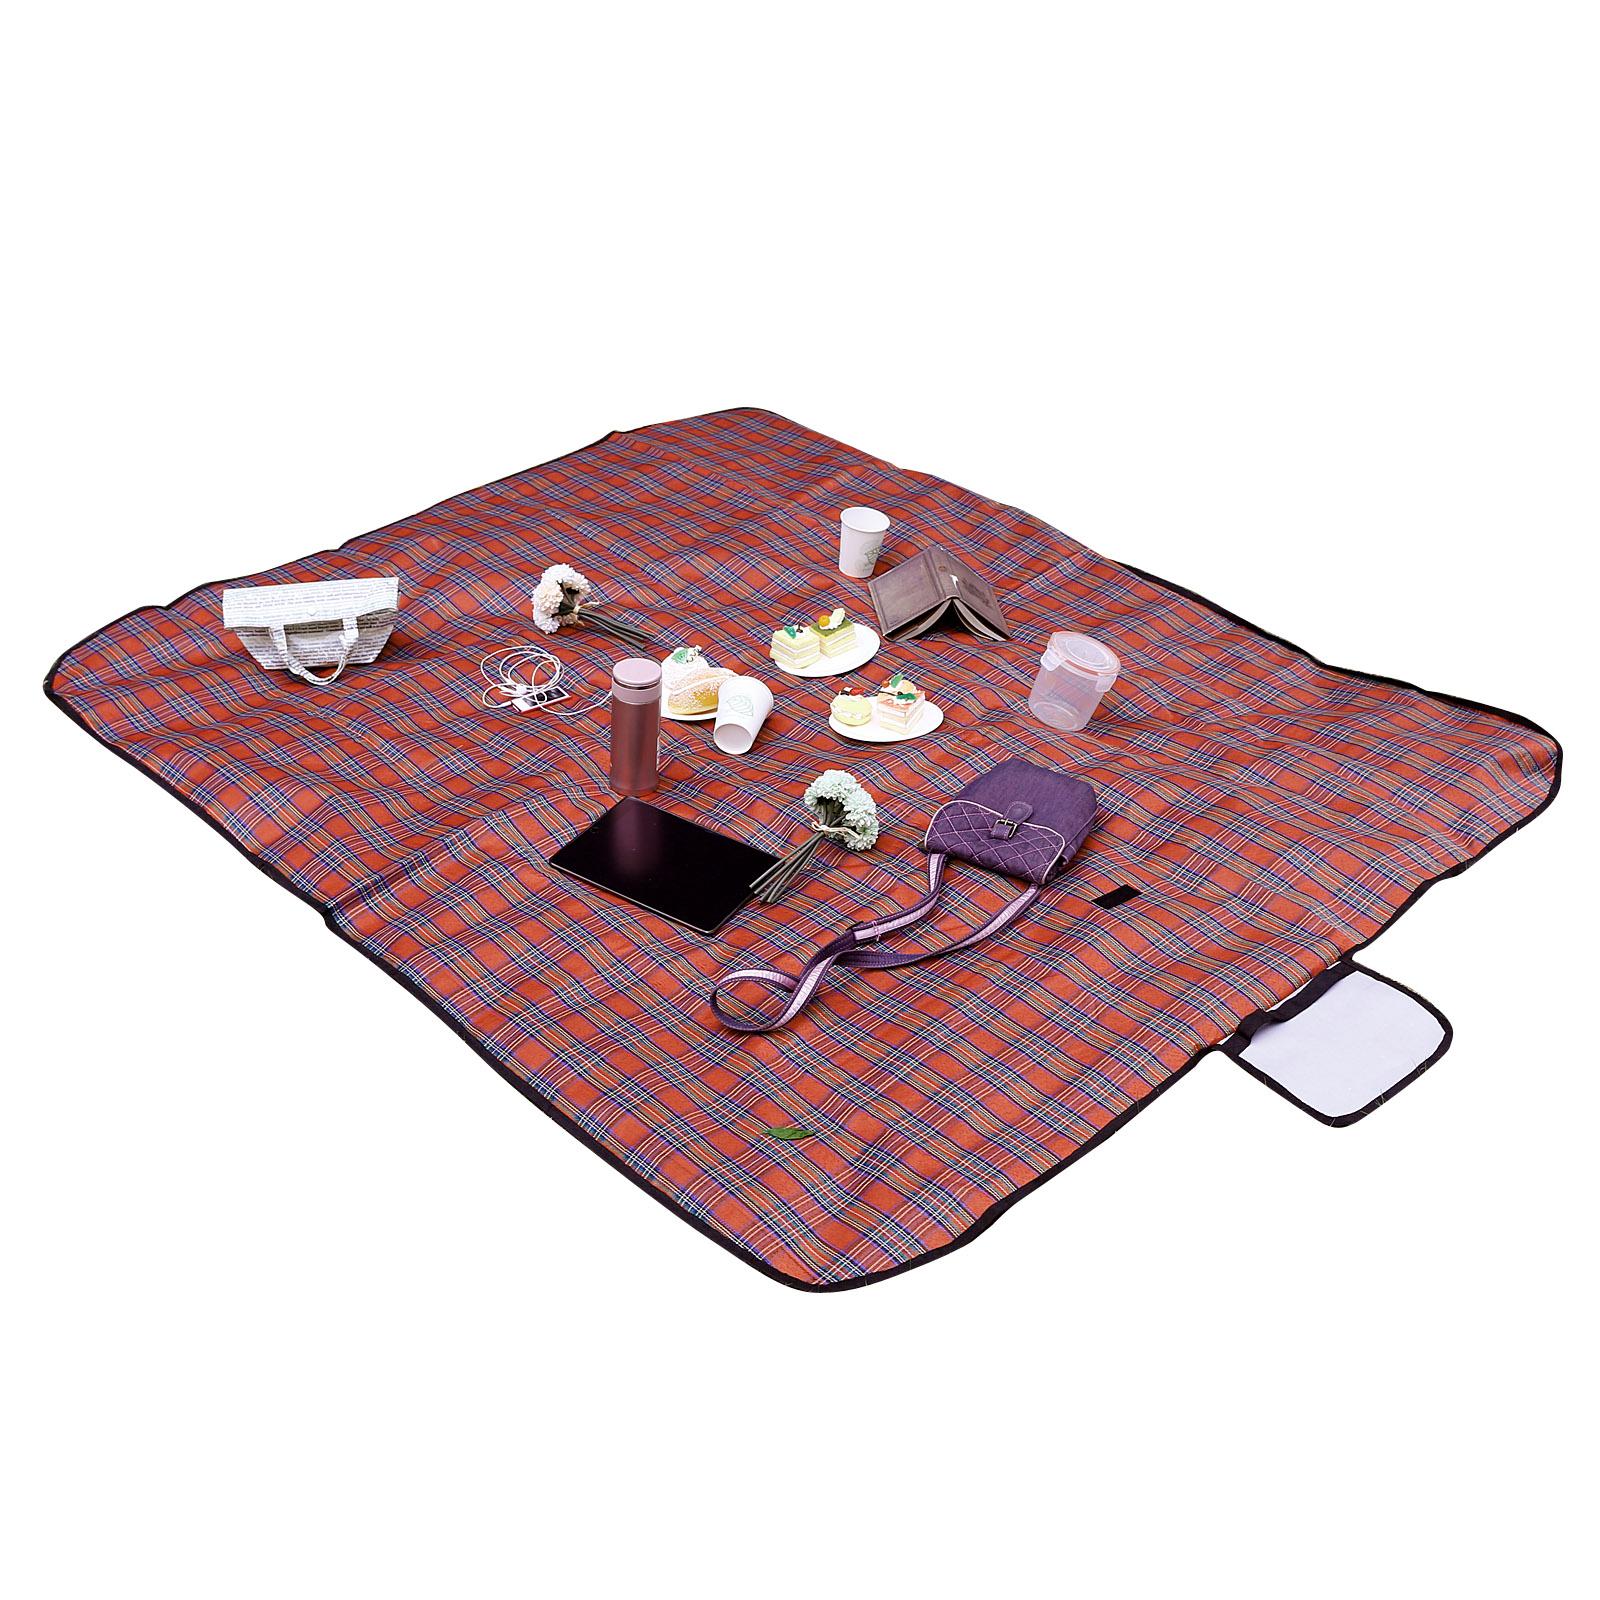 Extra Waterproof Picnic Mat Blanket Rug Travel